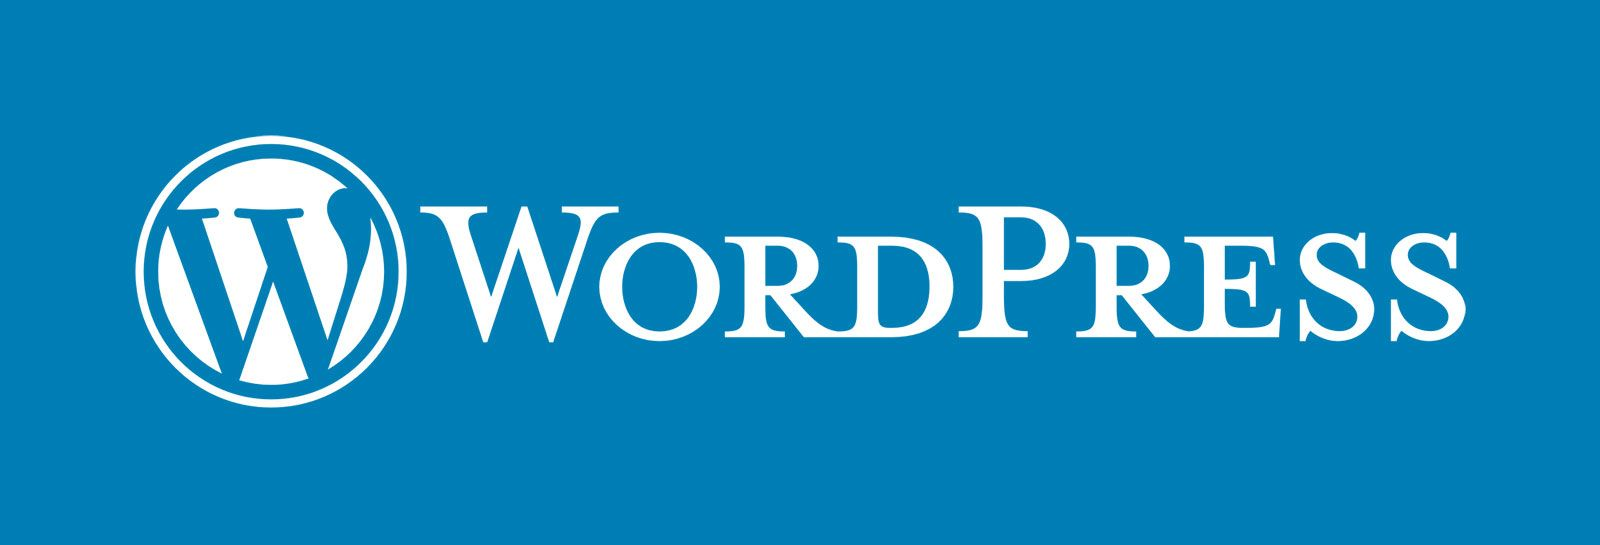 Wordpress logo on blue background banner image